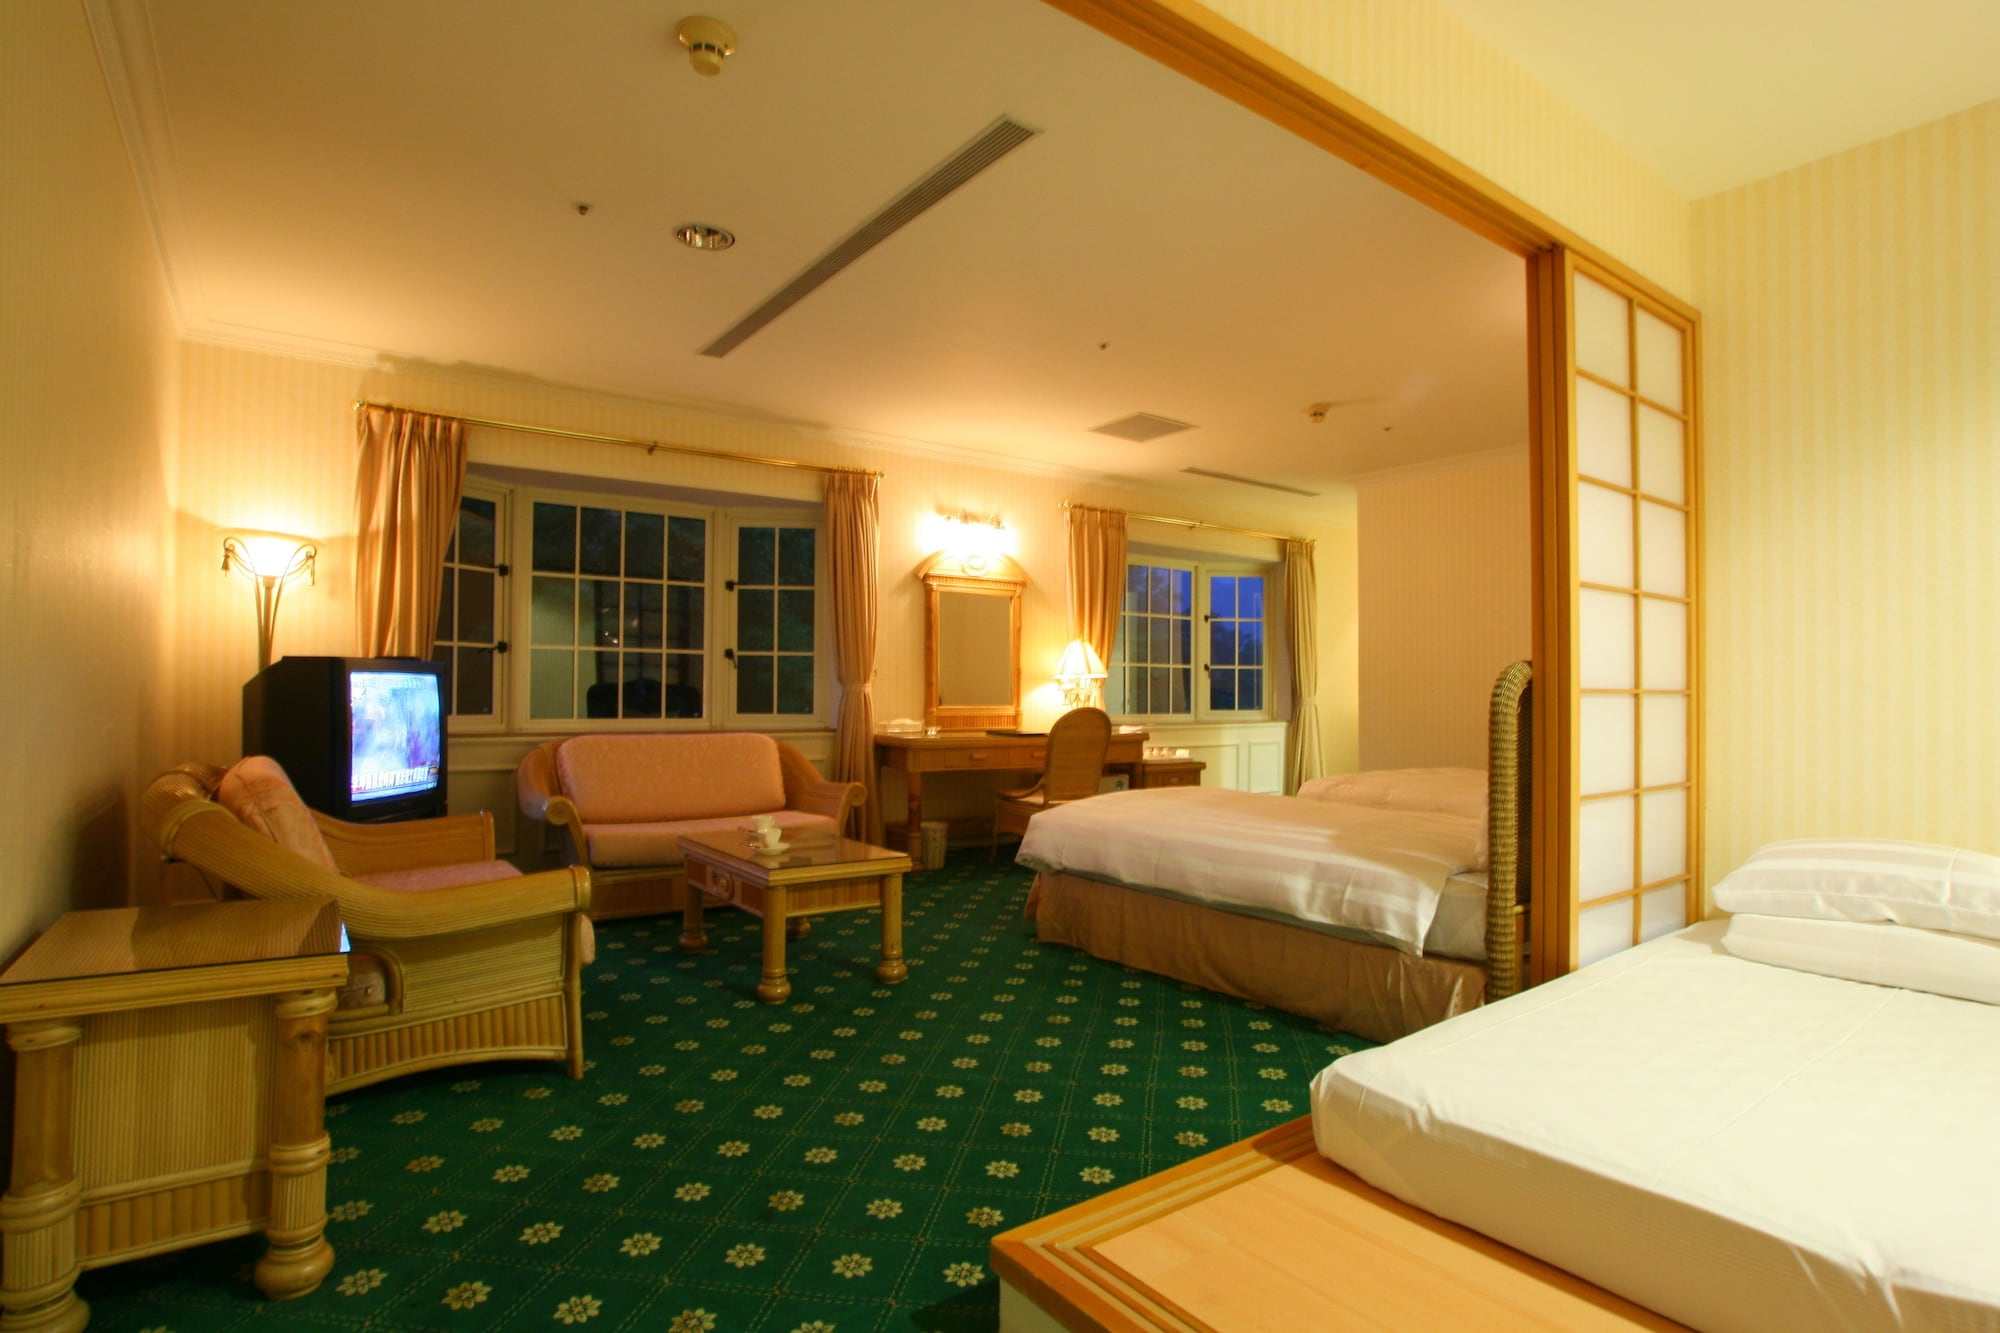 Life Leisure Resort, Hsinchu County